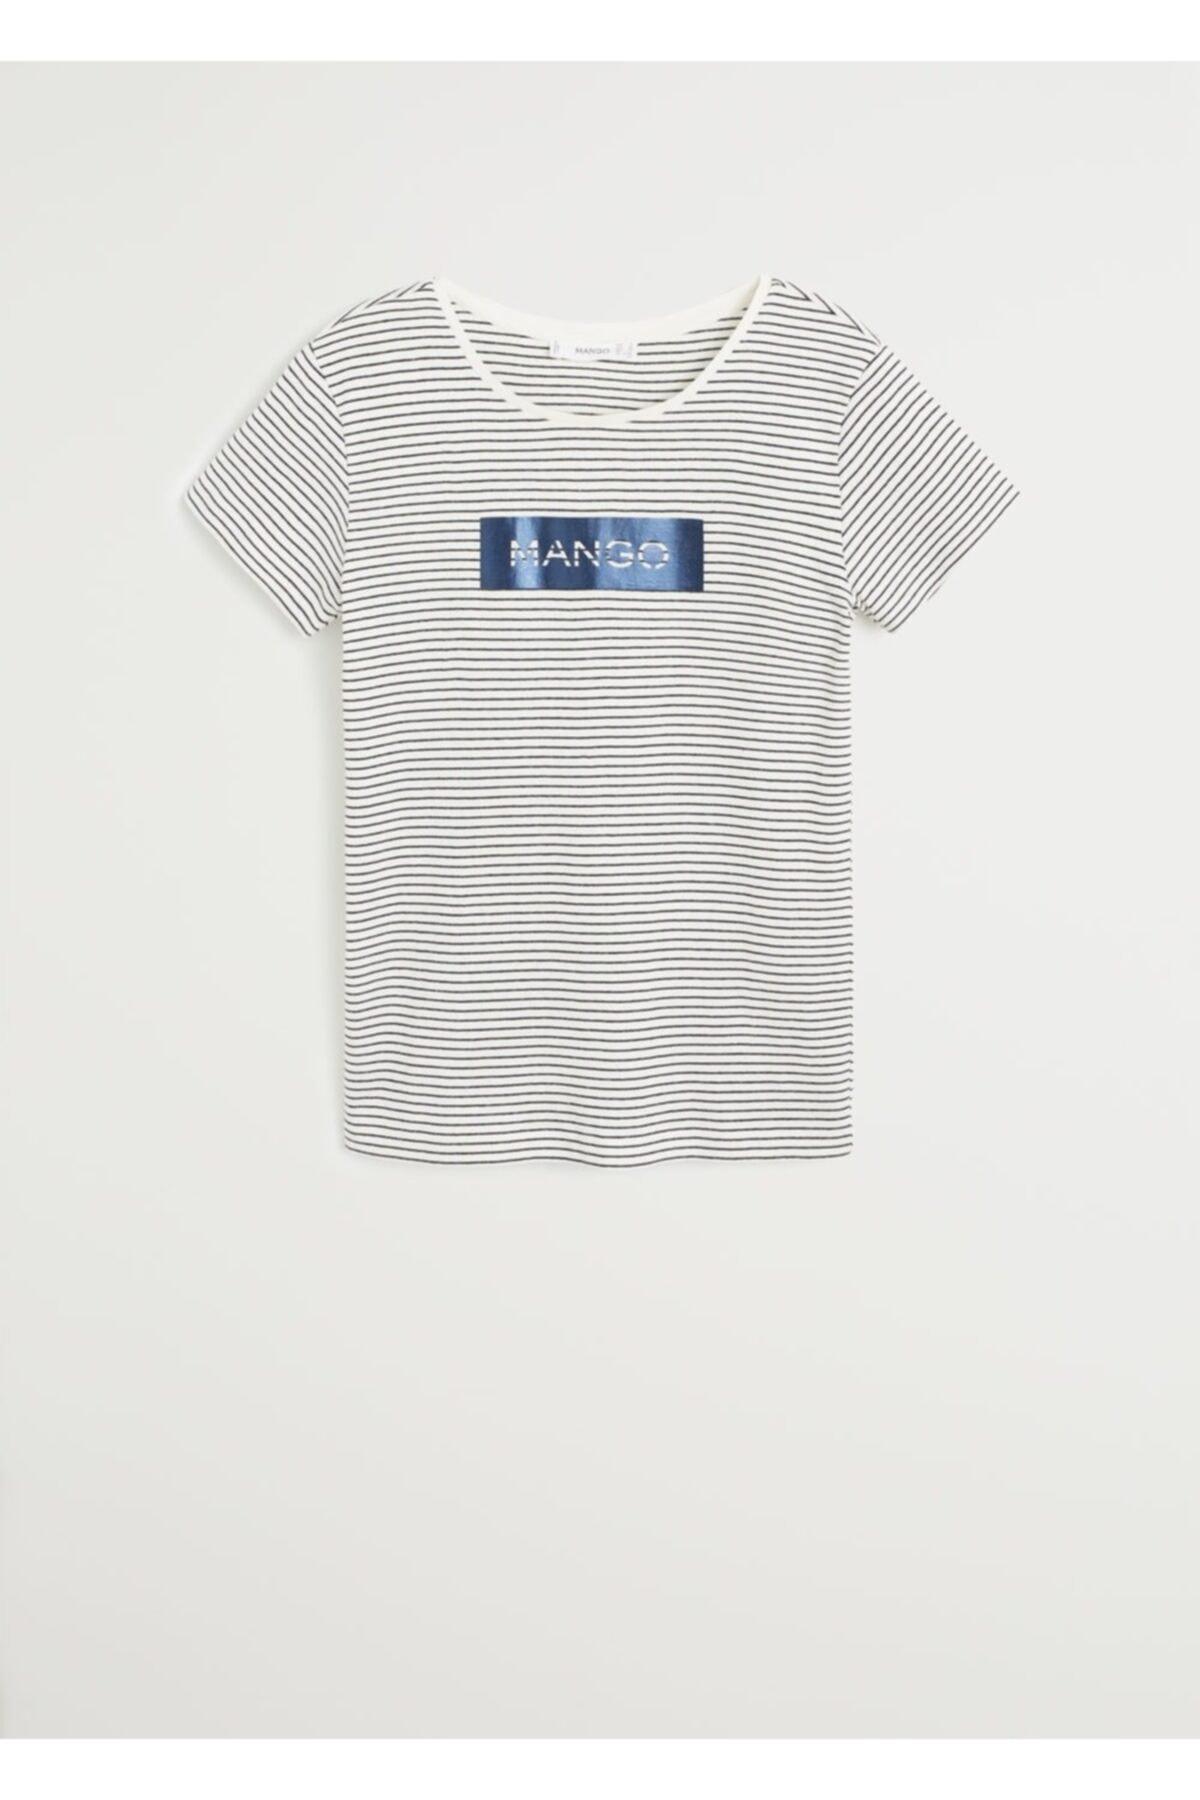 MANGO Woman Kadın Lacivert Pamuklu Logolu Tişört 67000604 2